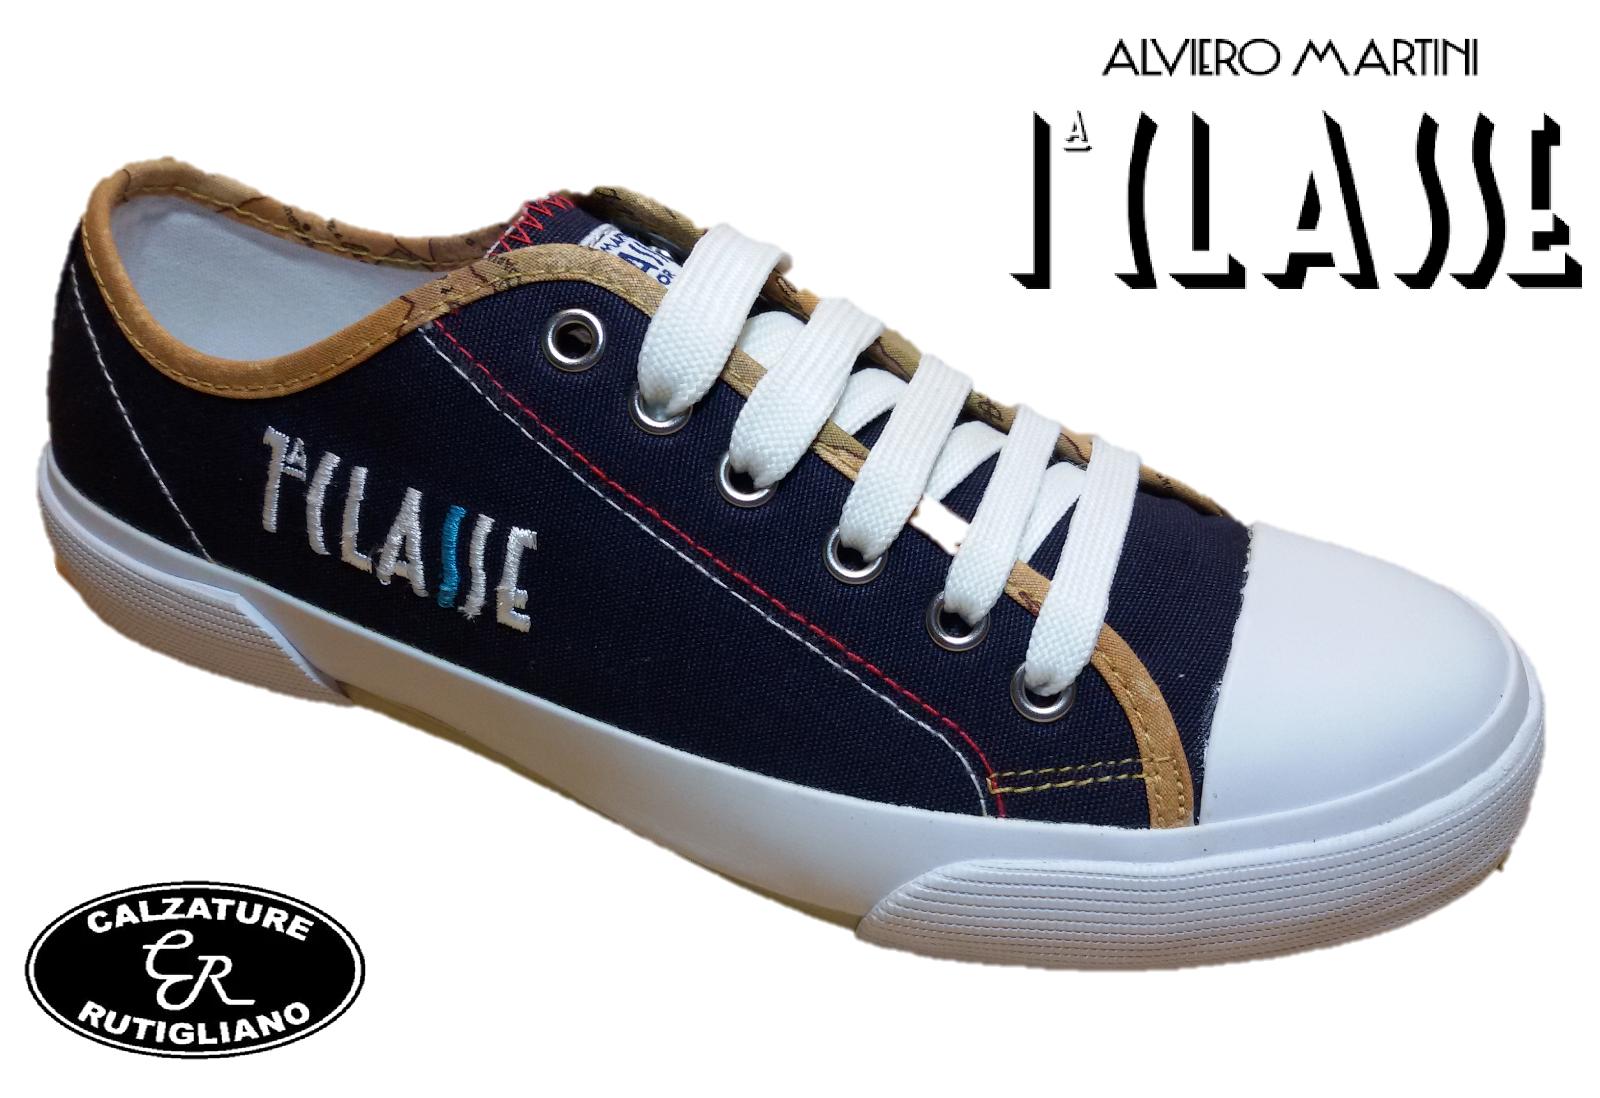 ALVIERO MARTINI - Prima Classe schuhe Damens RAGAZZA TELA BLU SNEAKERS - 0377